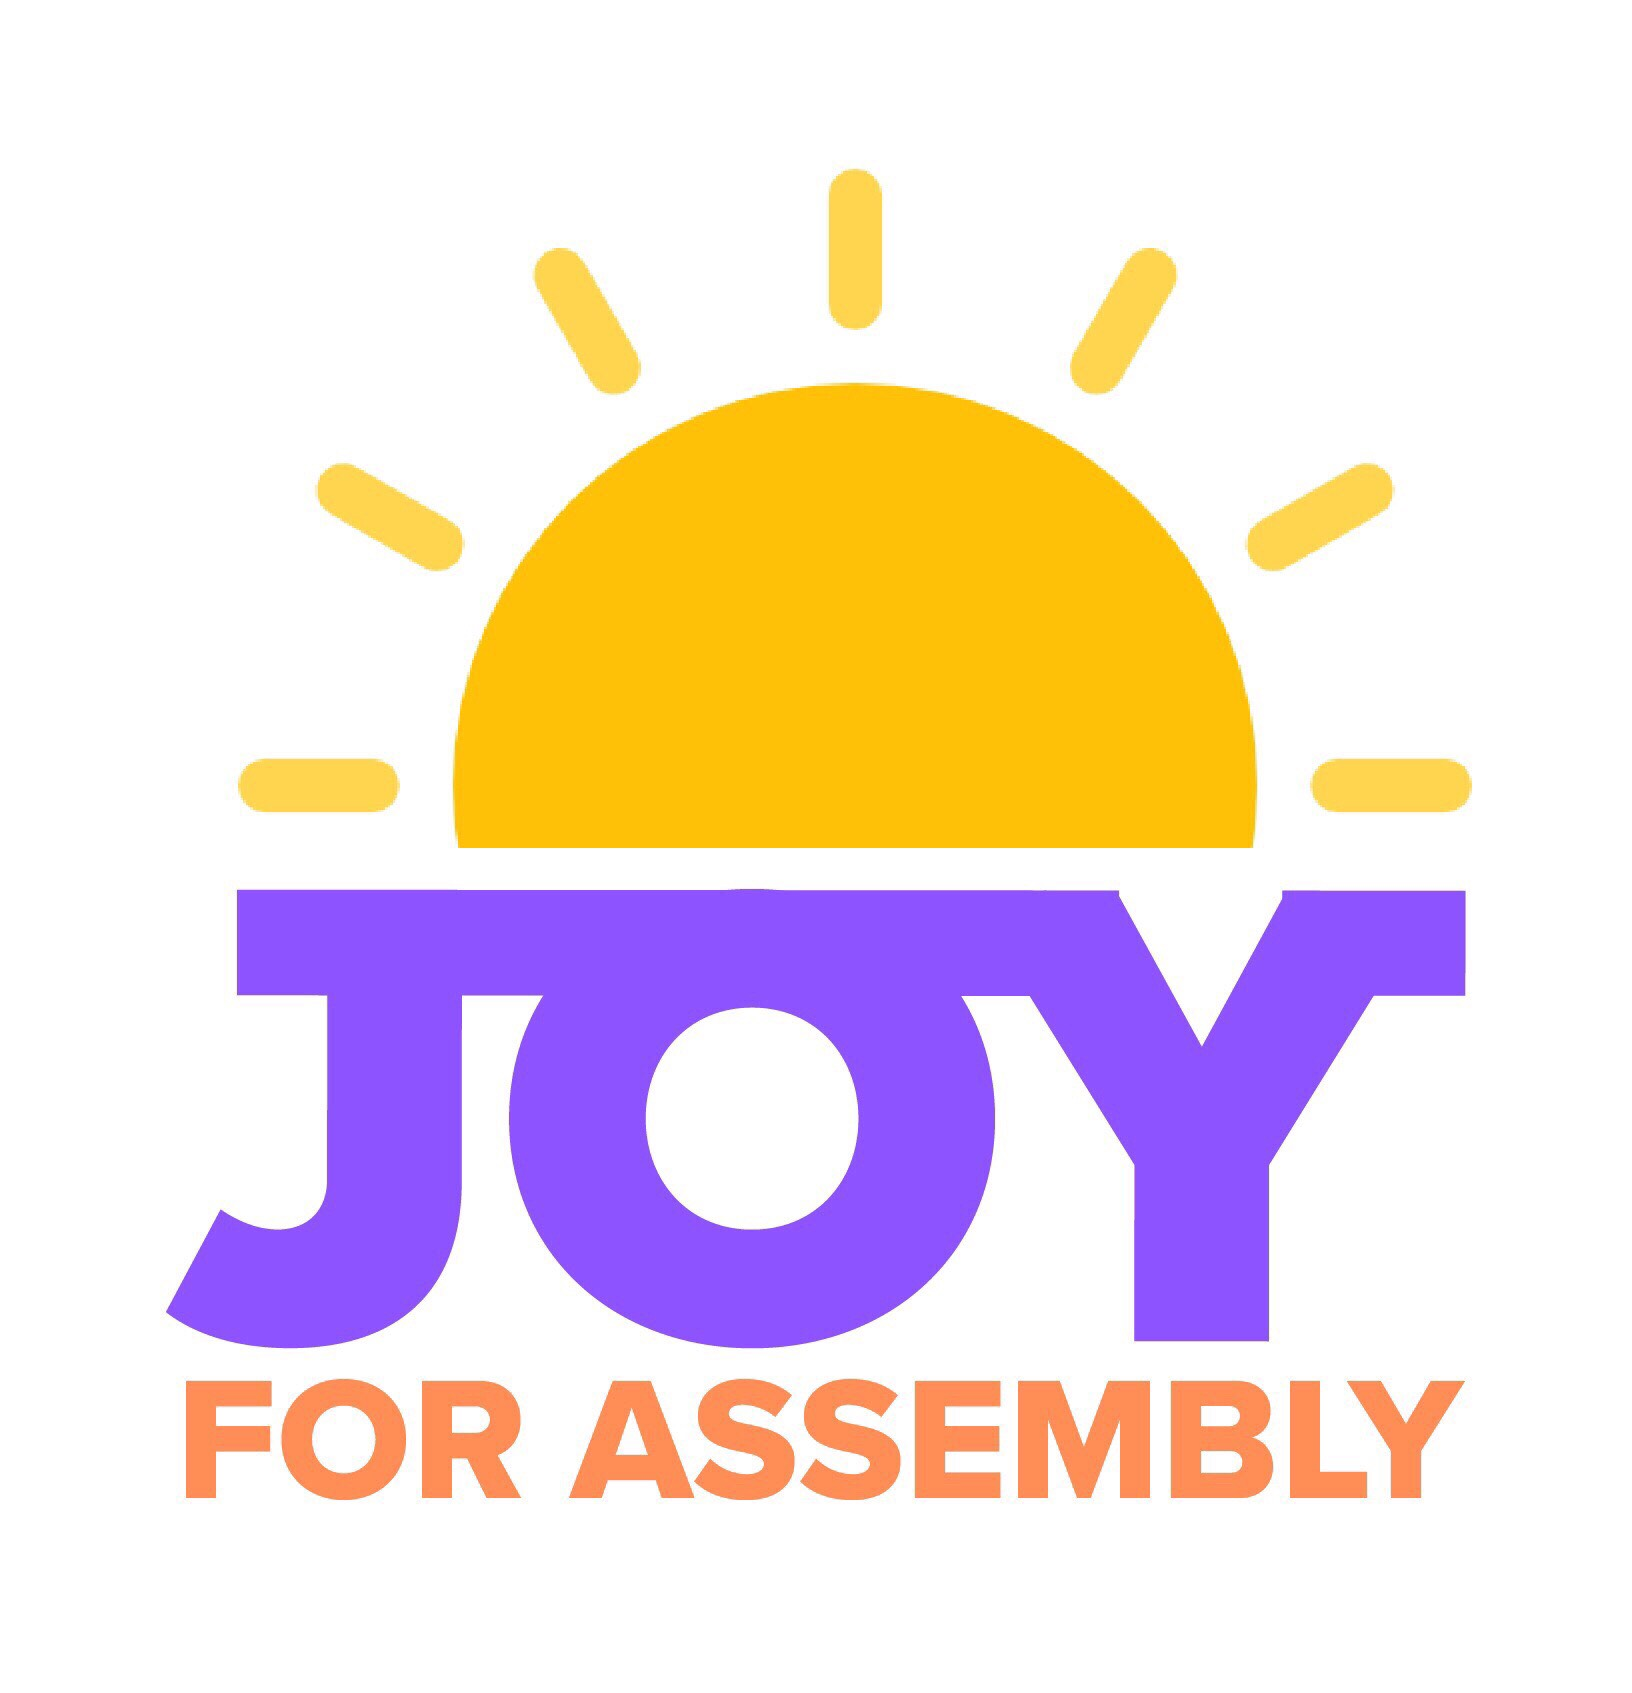 Joy Chowdhury